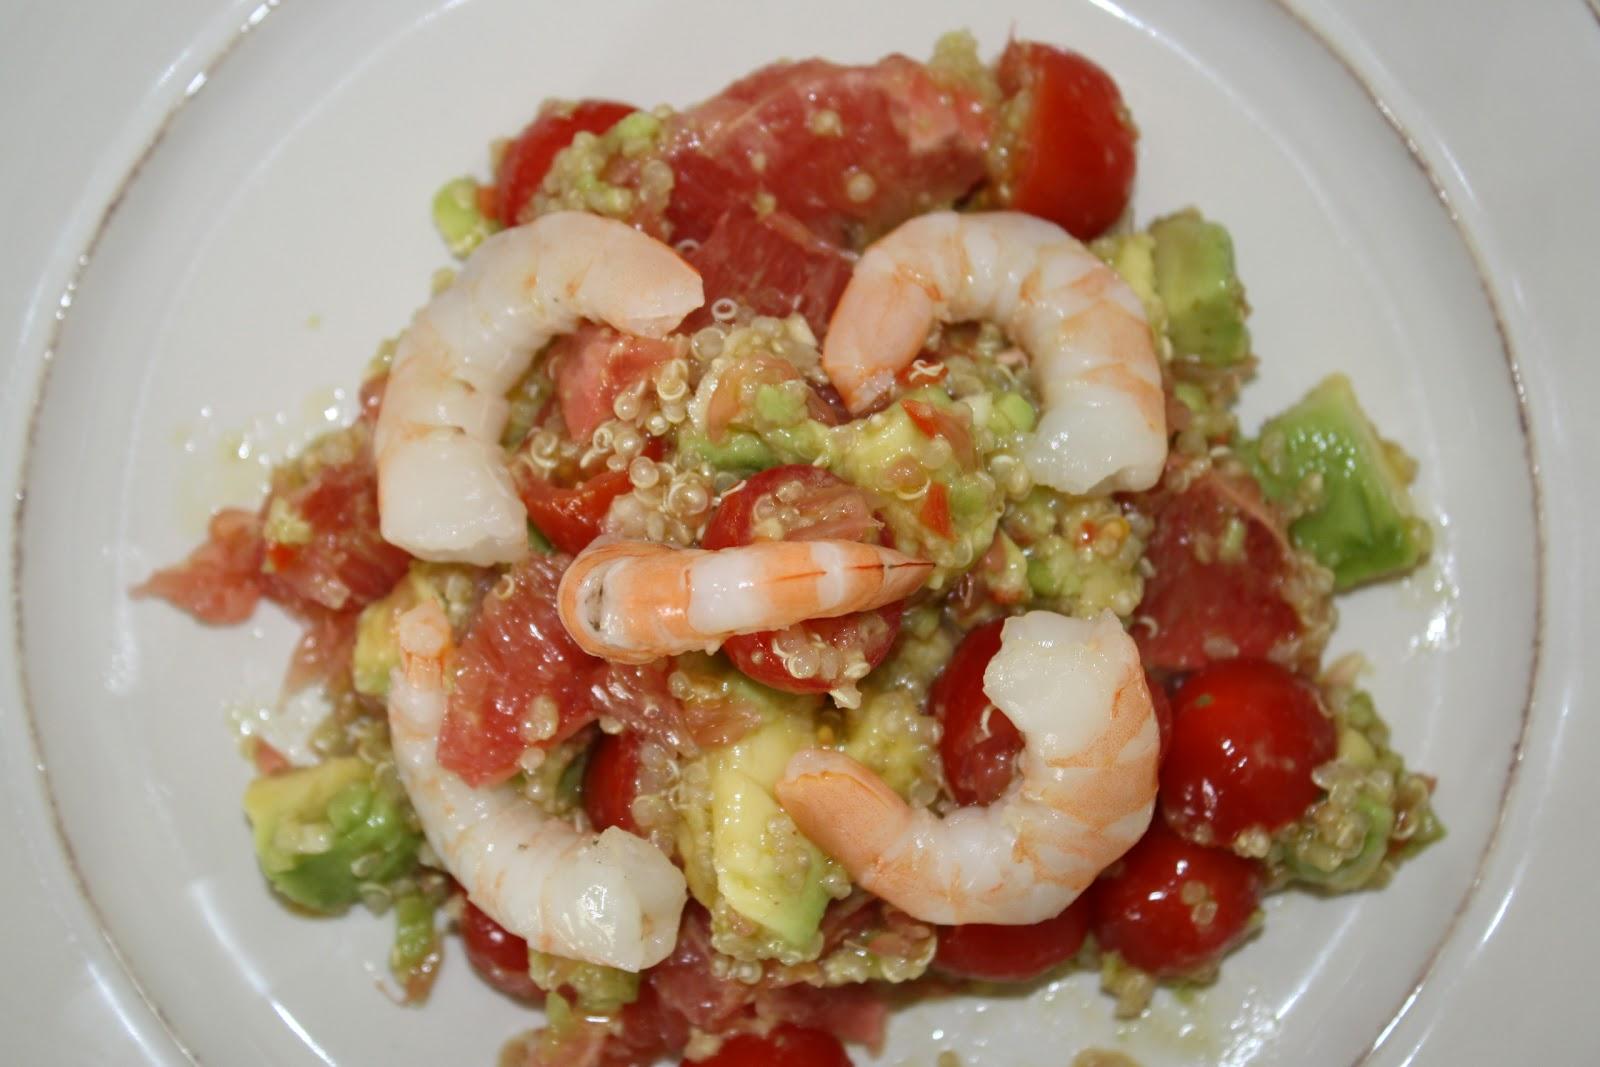 Kriket's cooking: Salade Quinoa-Crevettes-Avocat-Pamplemousse